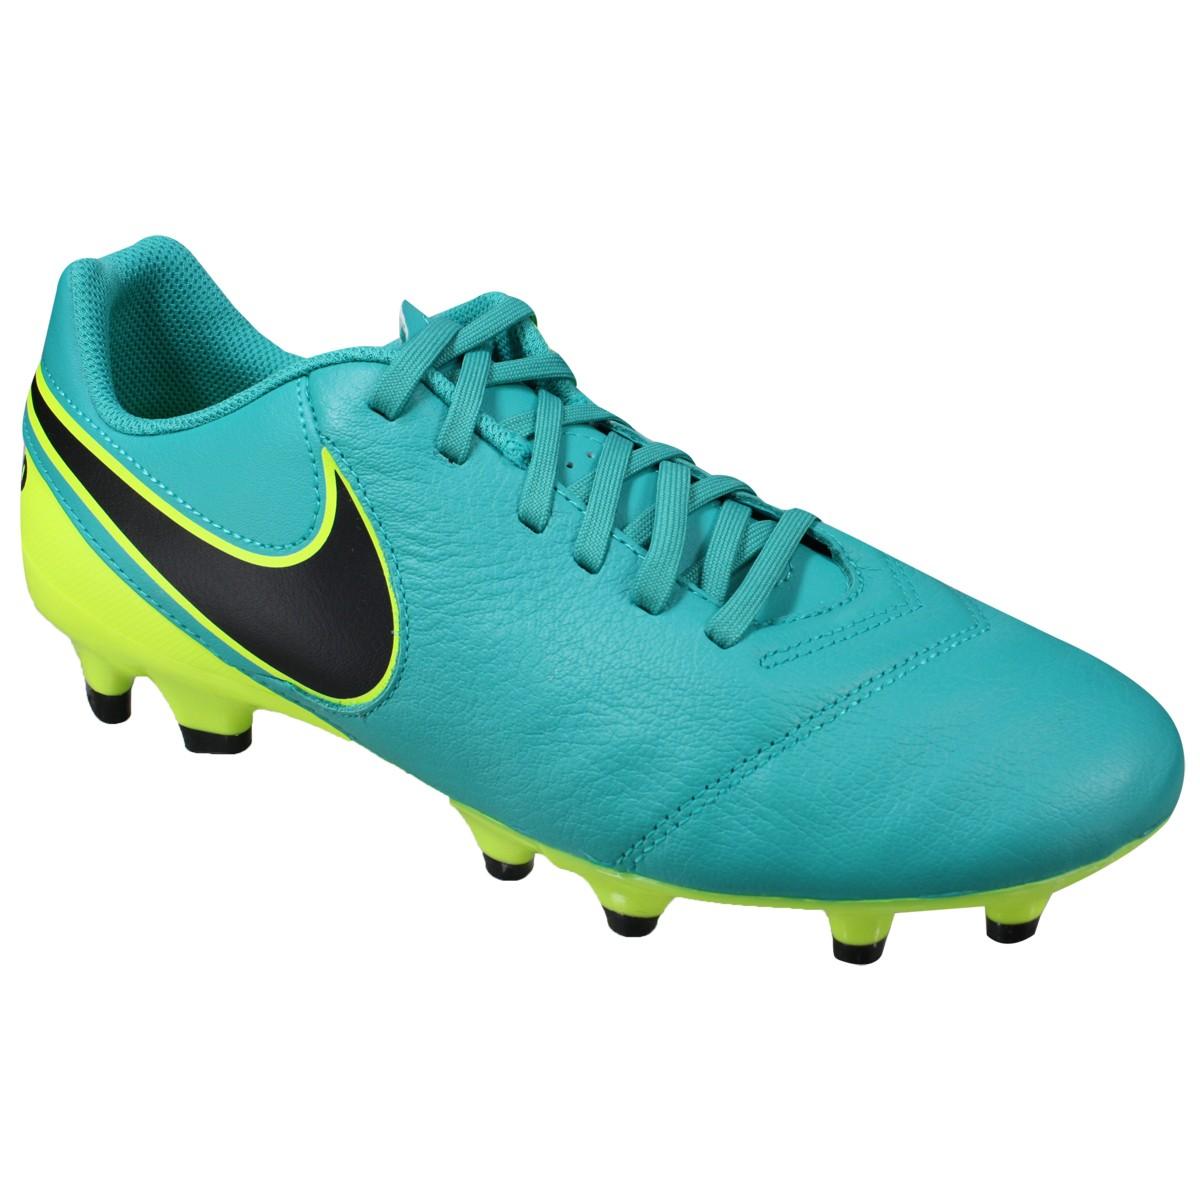 Chuteira Tiempo Genio II Leather FG Nike 819213-307 - Verde - Botas ... b3c6f0121c0d7